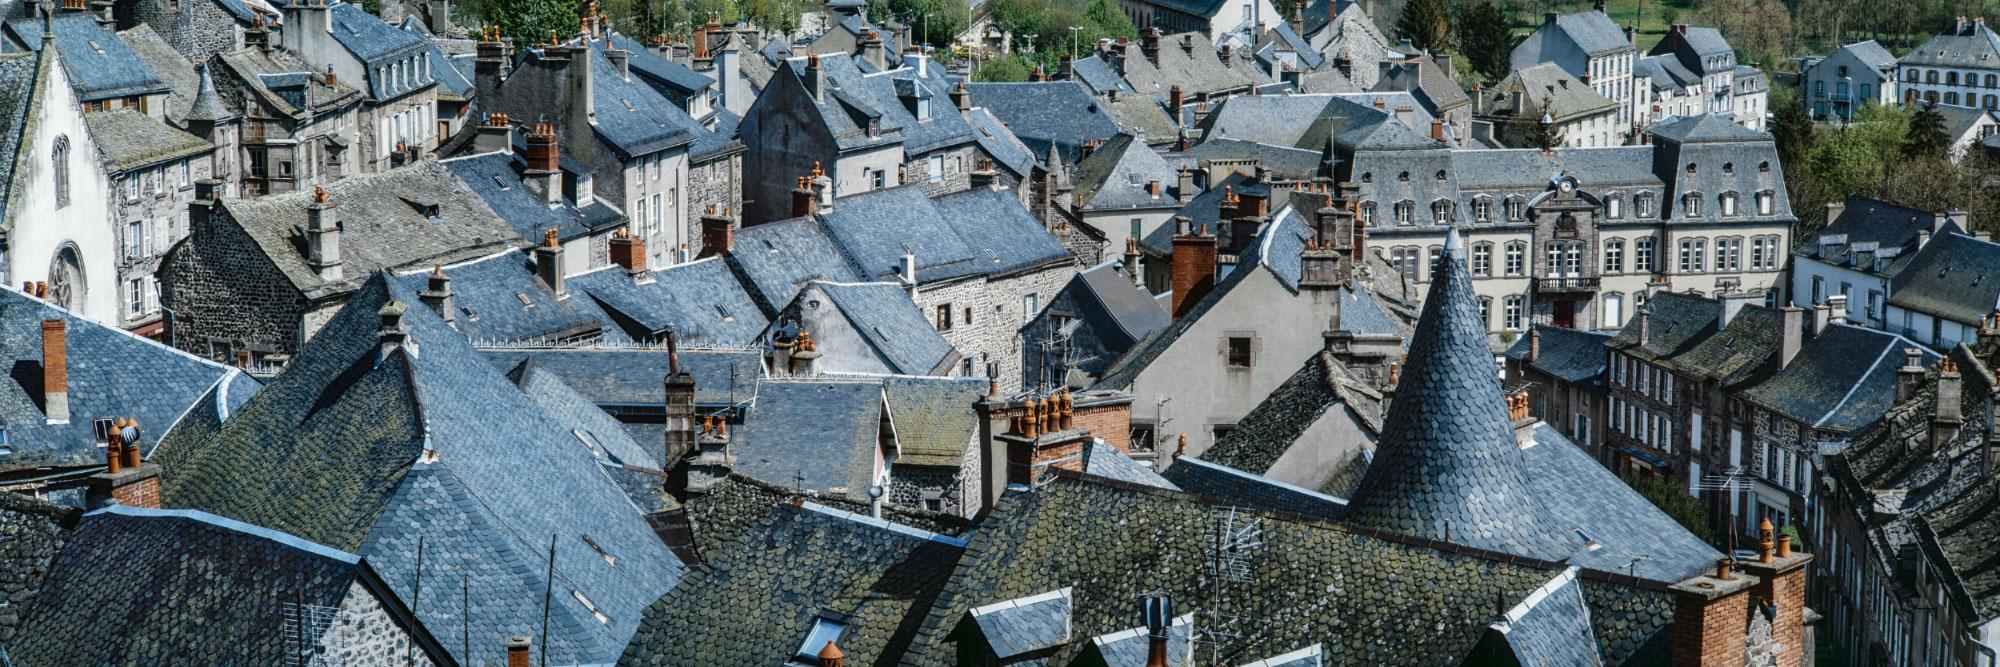 Toits de Murat, Cantal